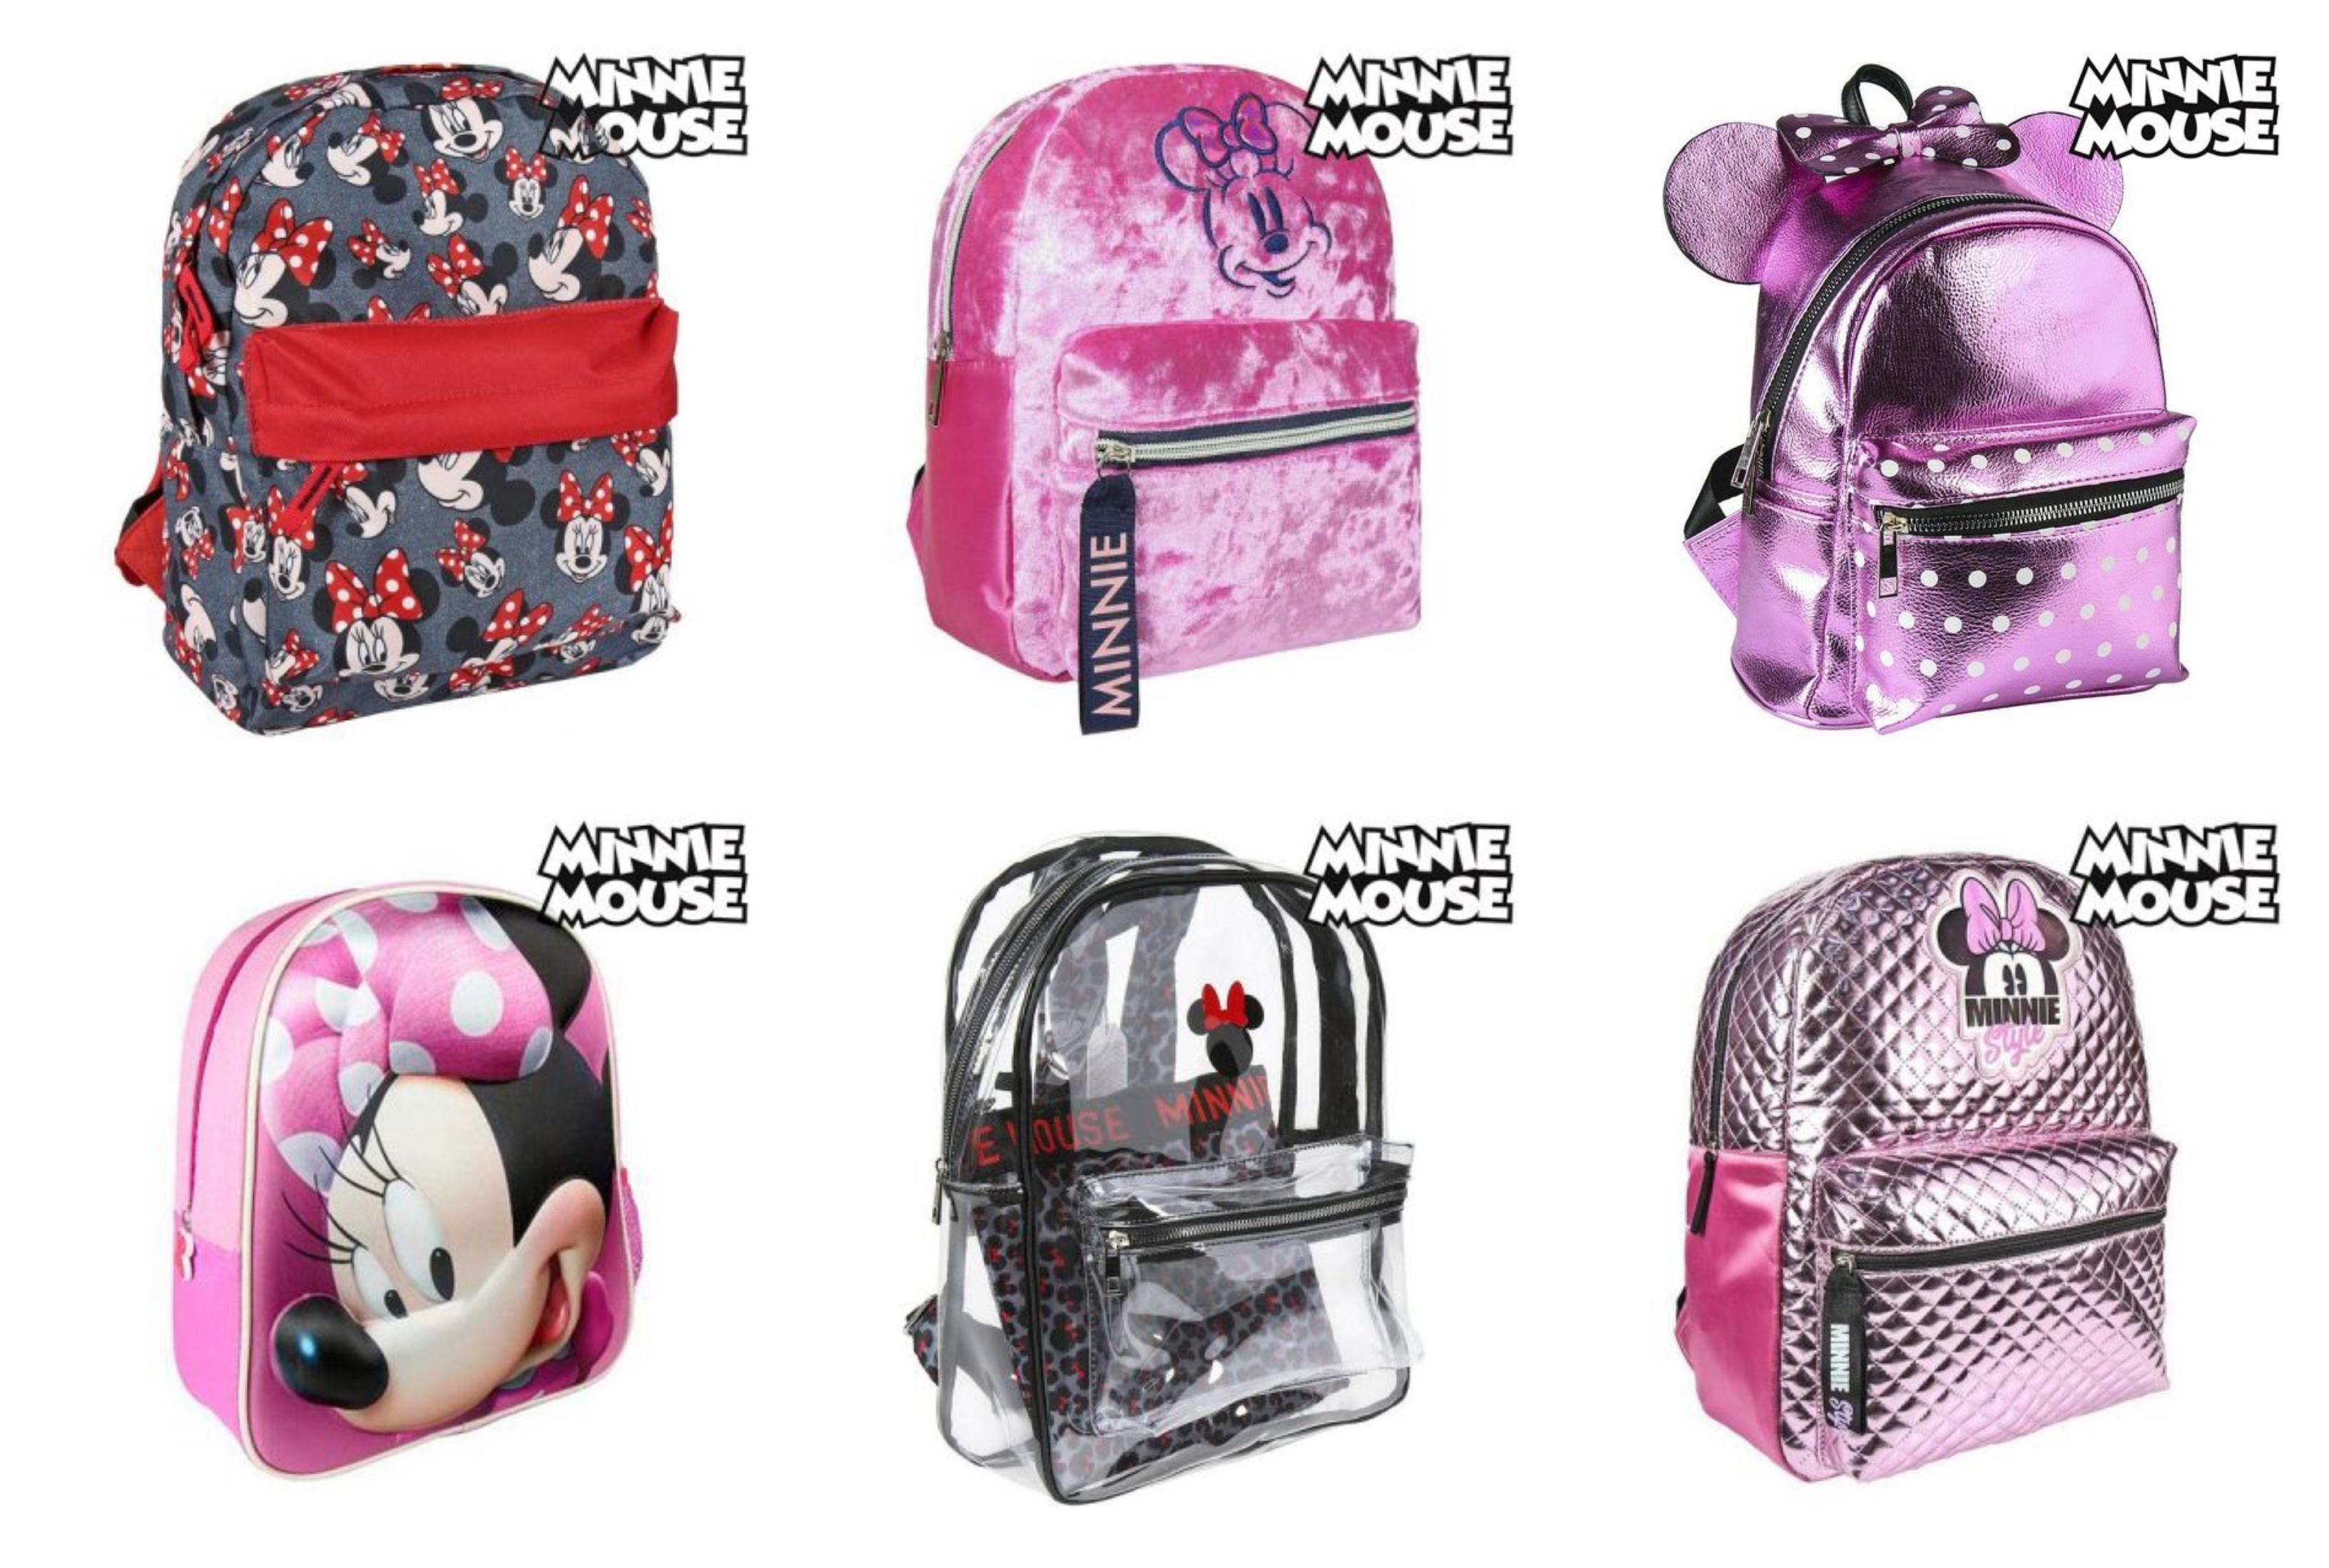 Minnie Mouse tasker til børn - Minnie Mouse rygsæk